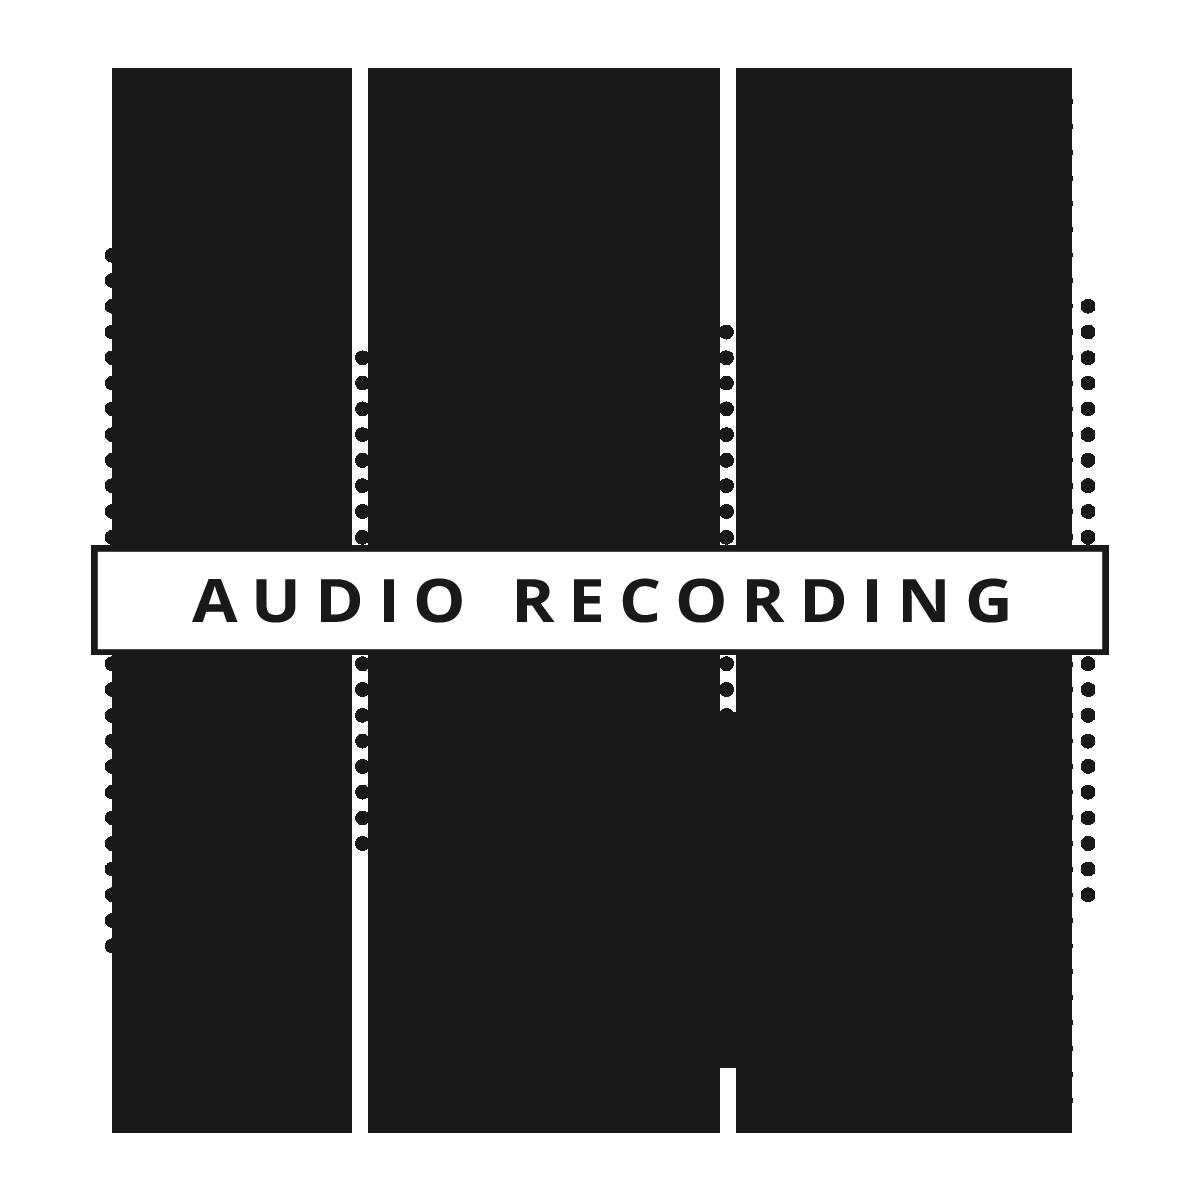 Listen-in Audio